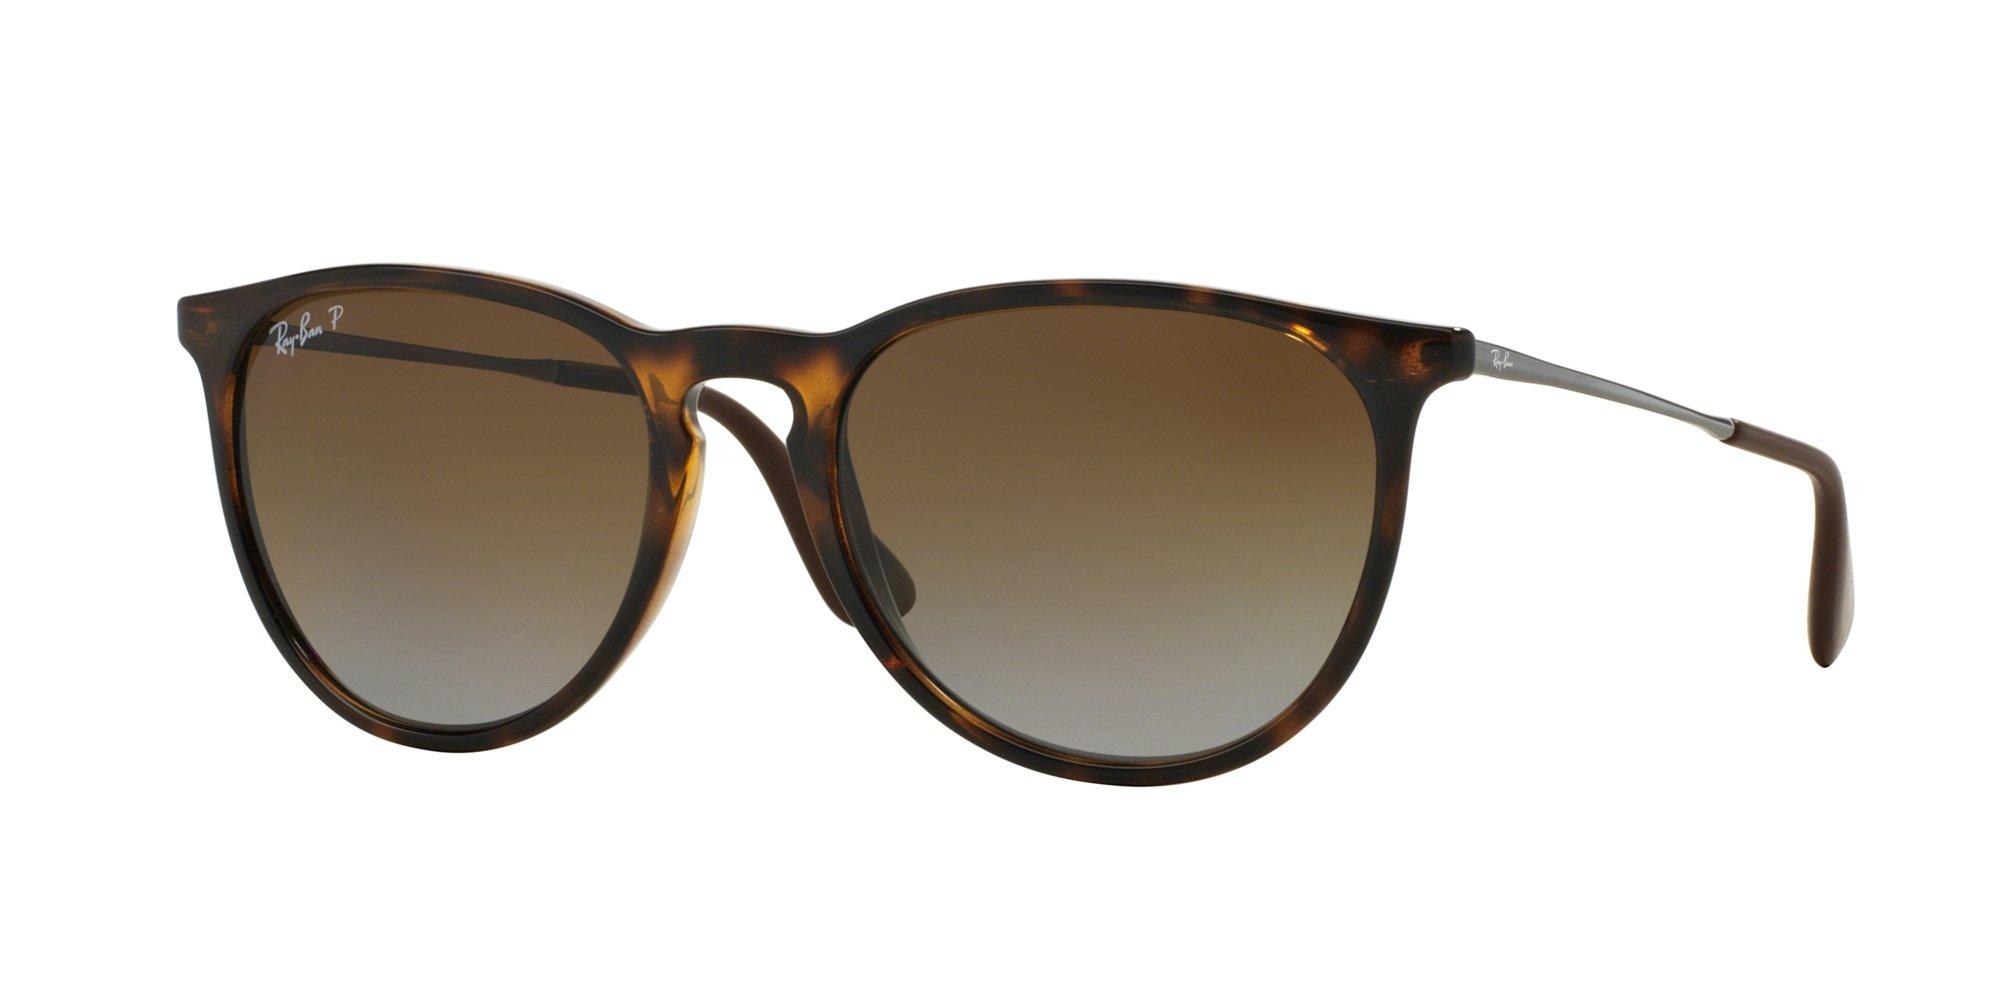 Ray Ban RB4171 710/T5 54M Havana/Polarized Brown Gardient+FREE Complimentary Eyewear Care Kit